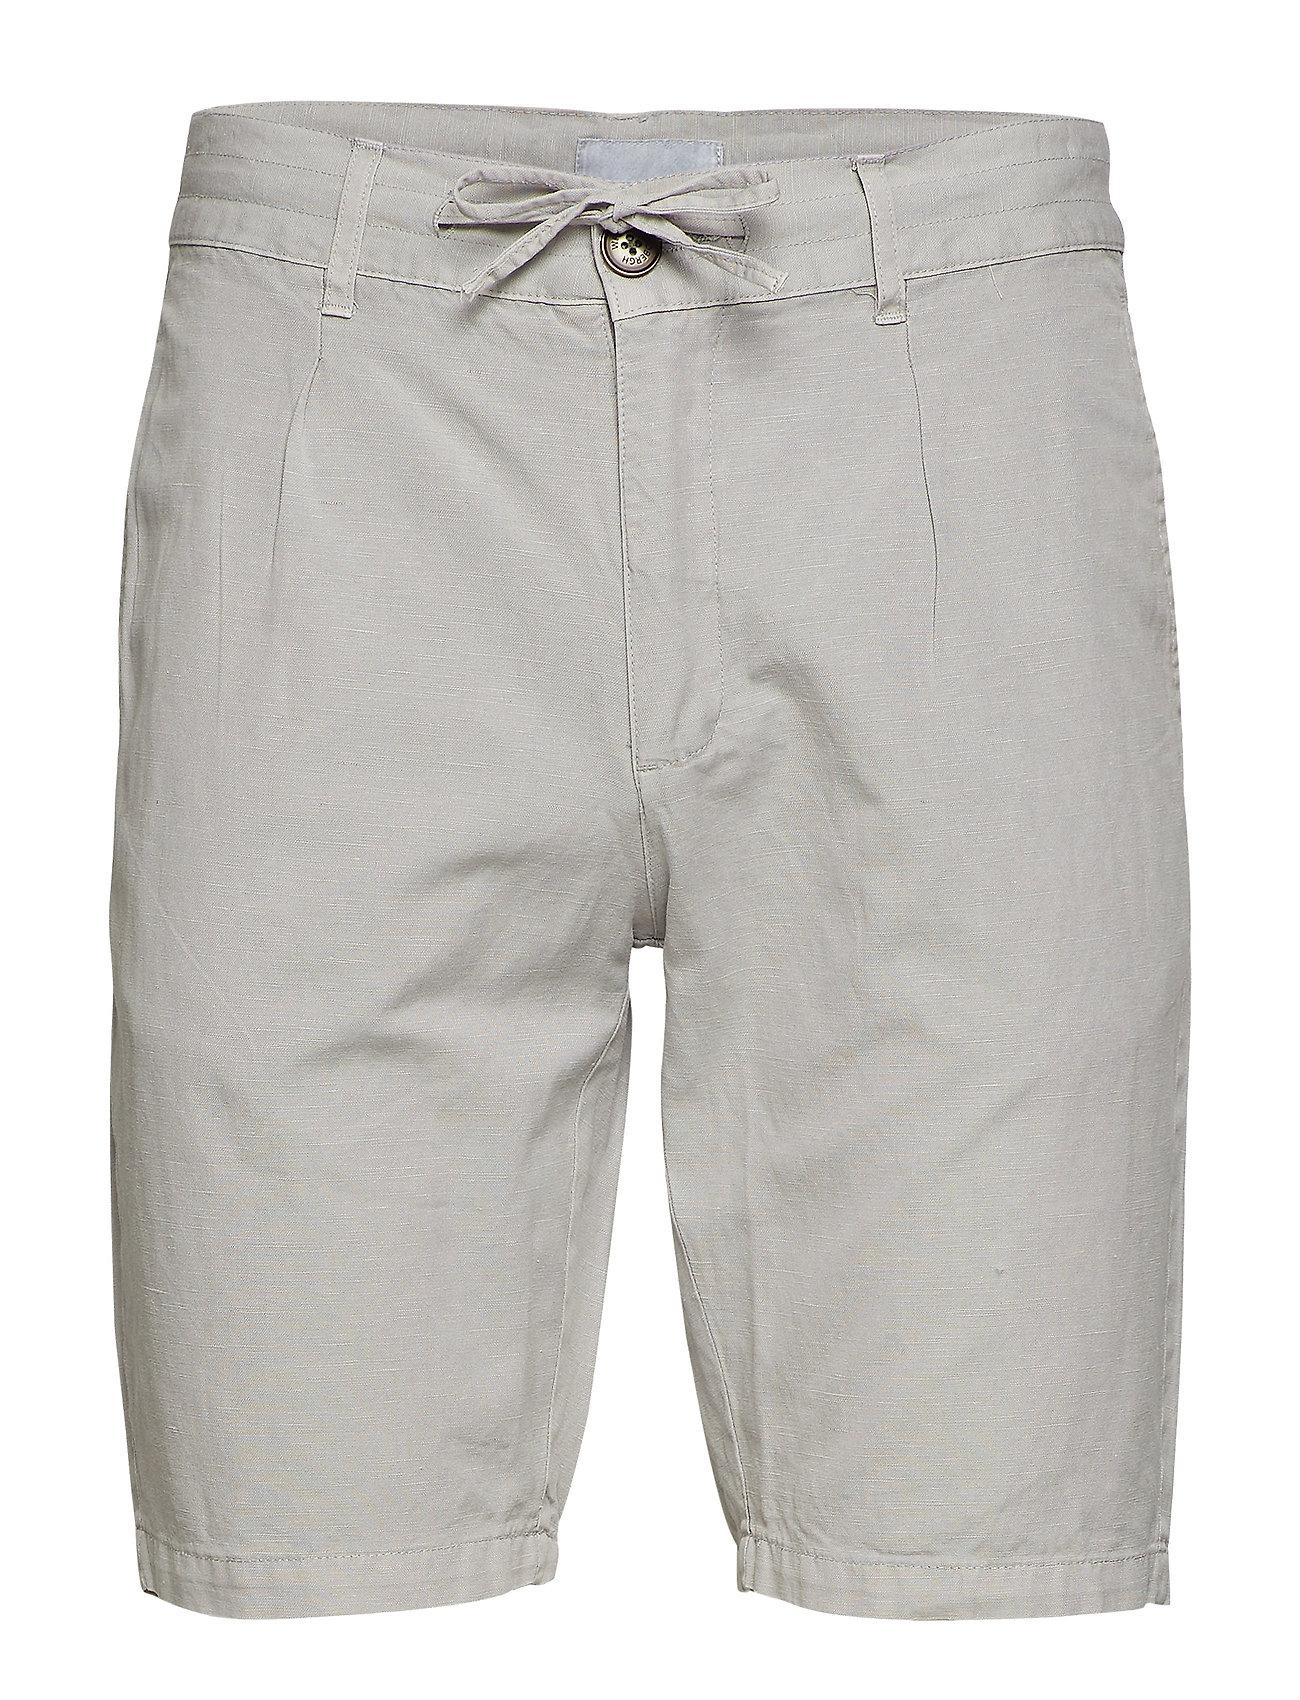 Lindbergh Linen shorts - GREY